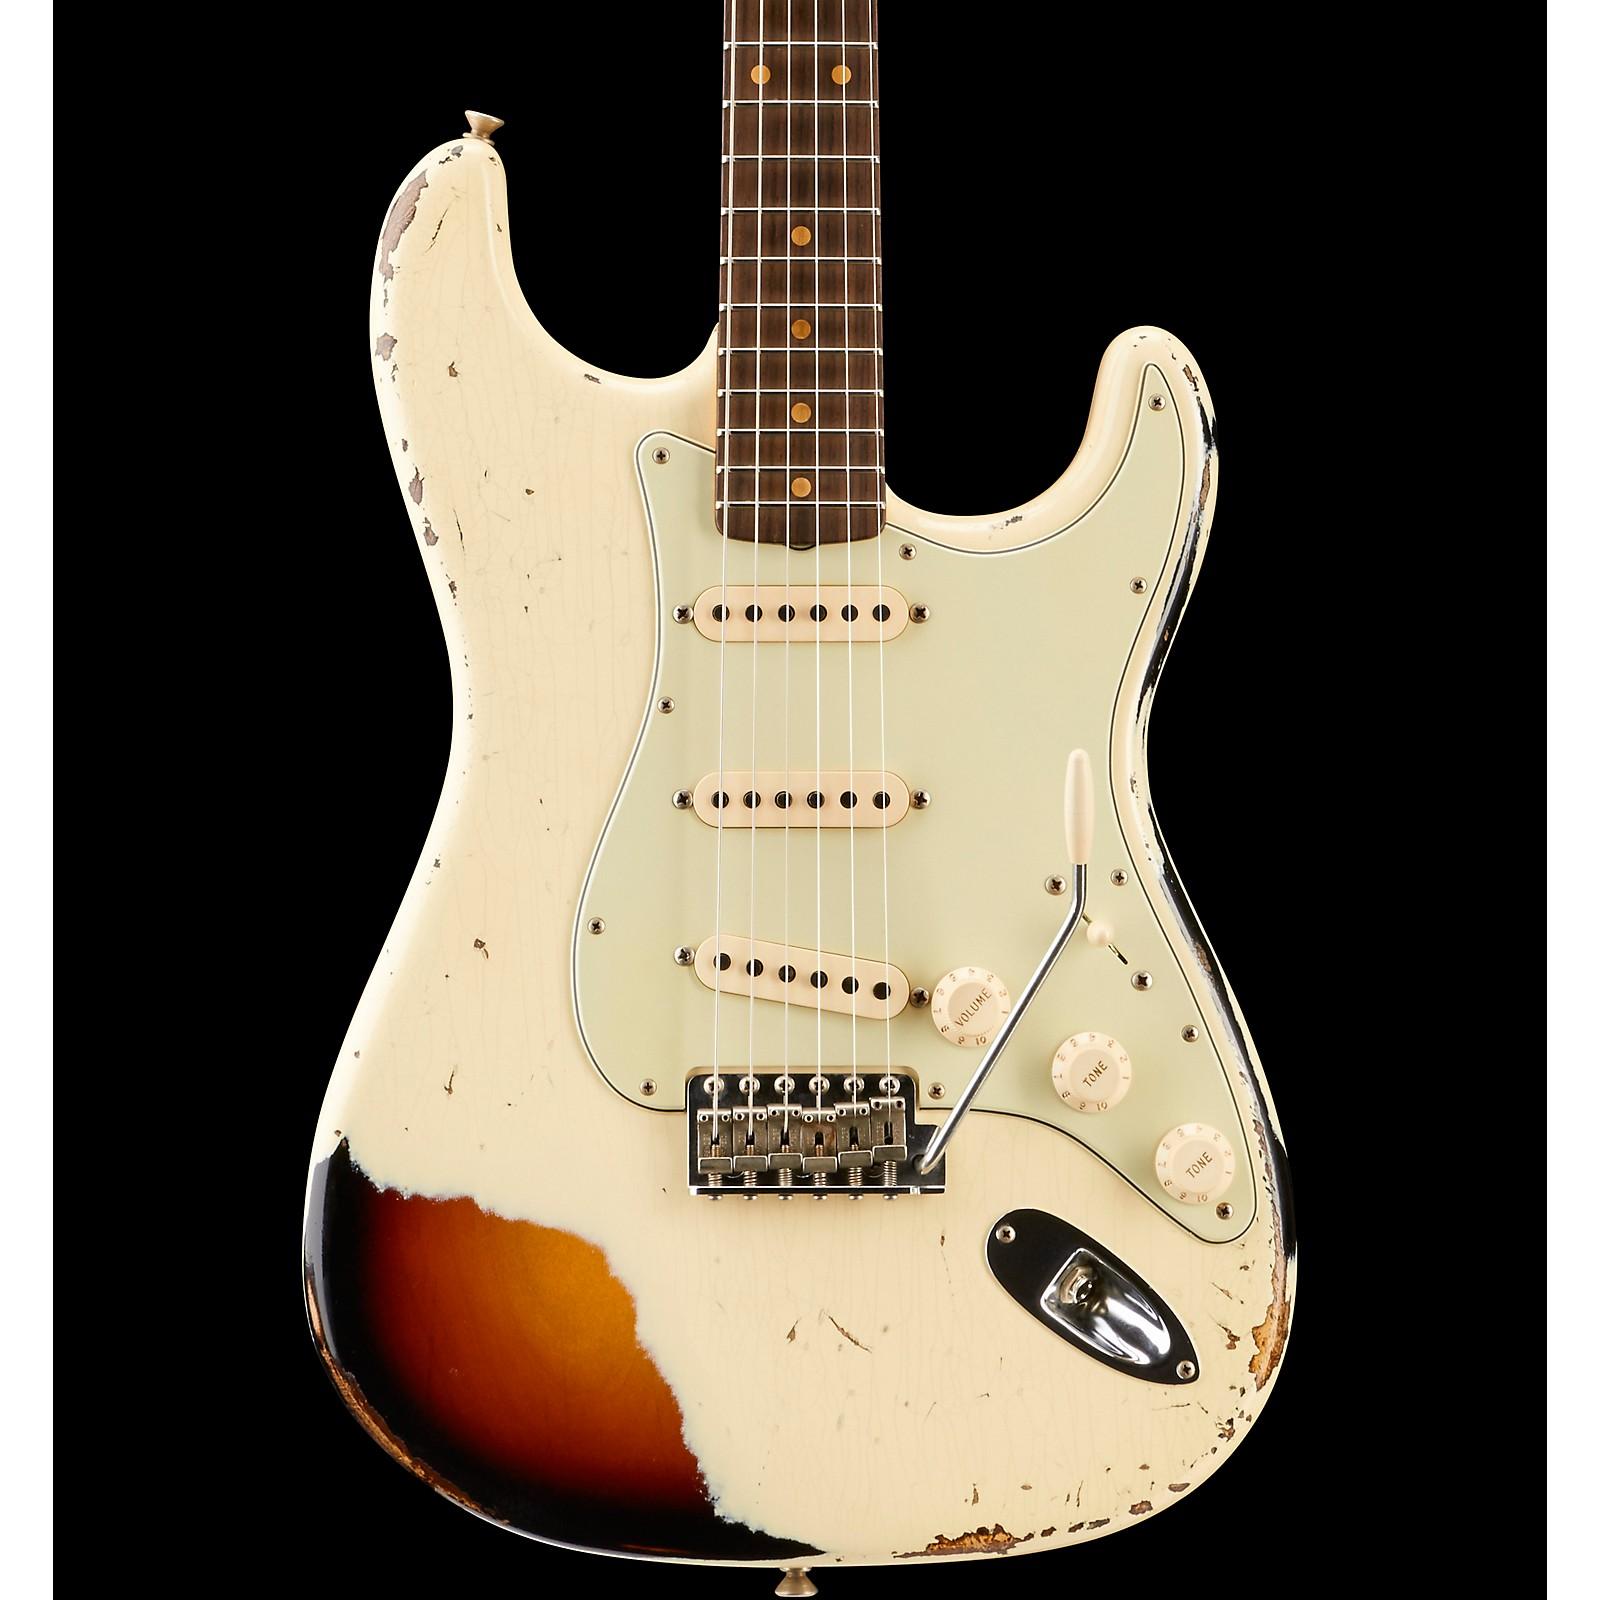 Fender Custom Shop '60s Stratocaster Heavy Relic Electric Guitar